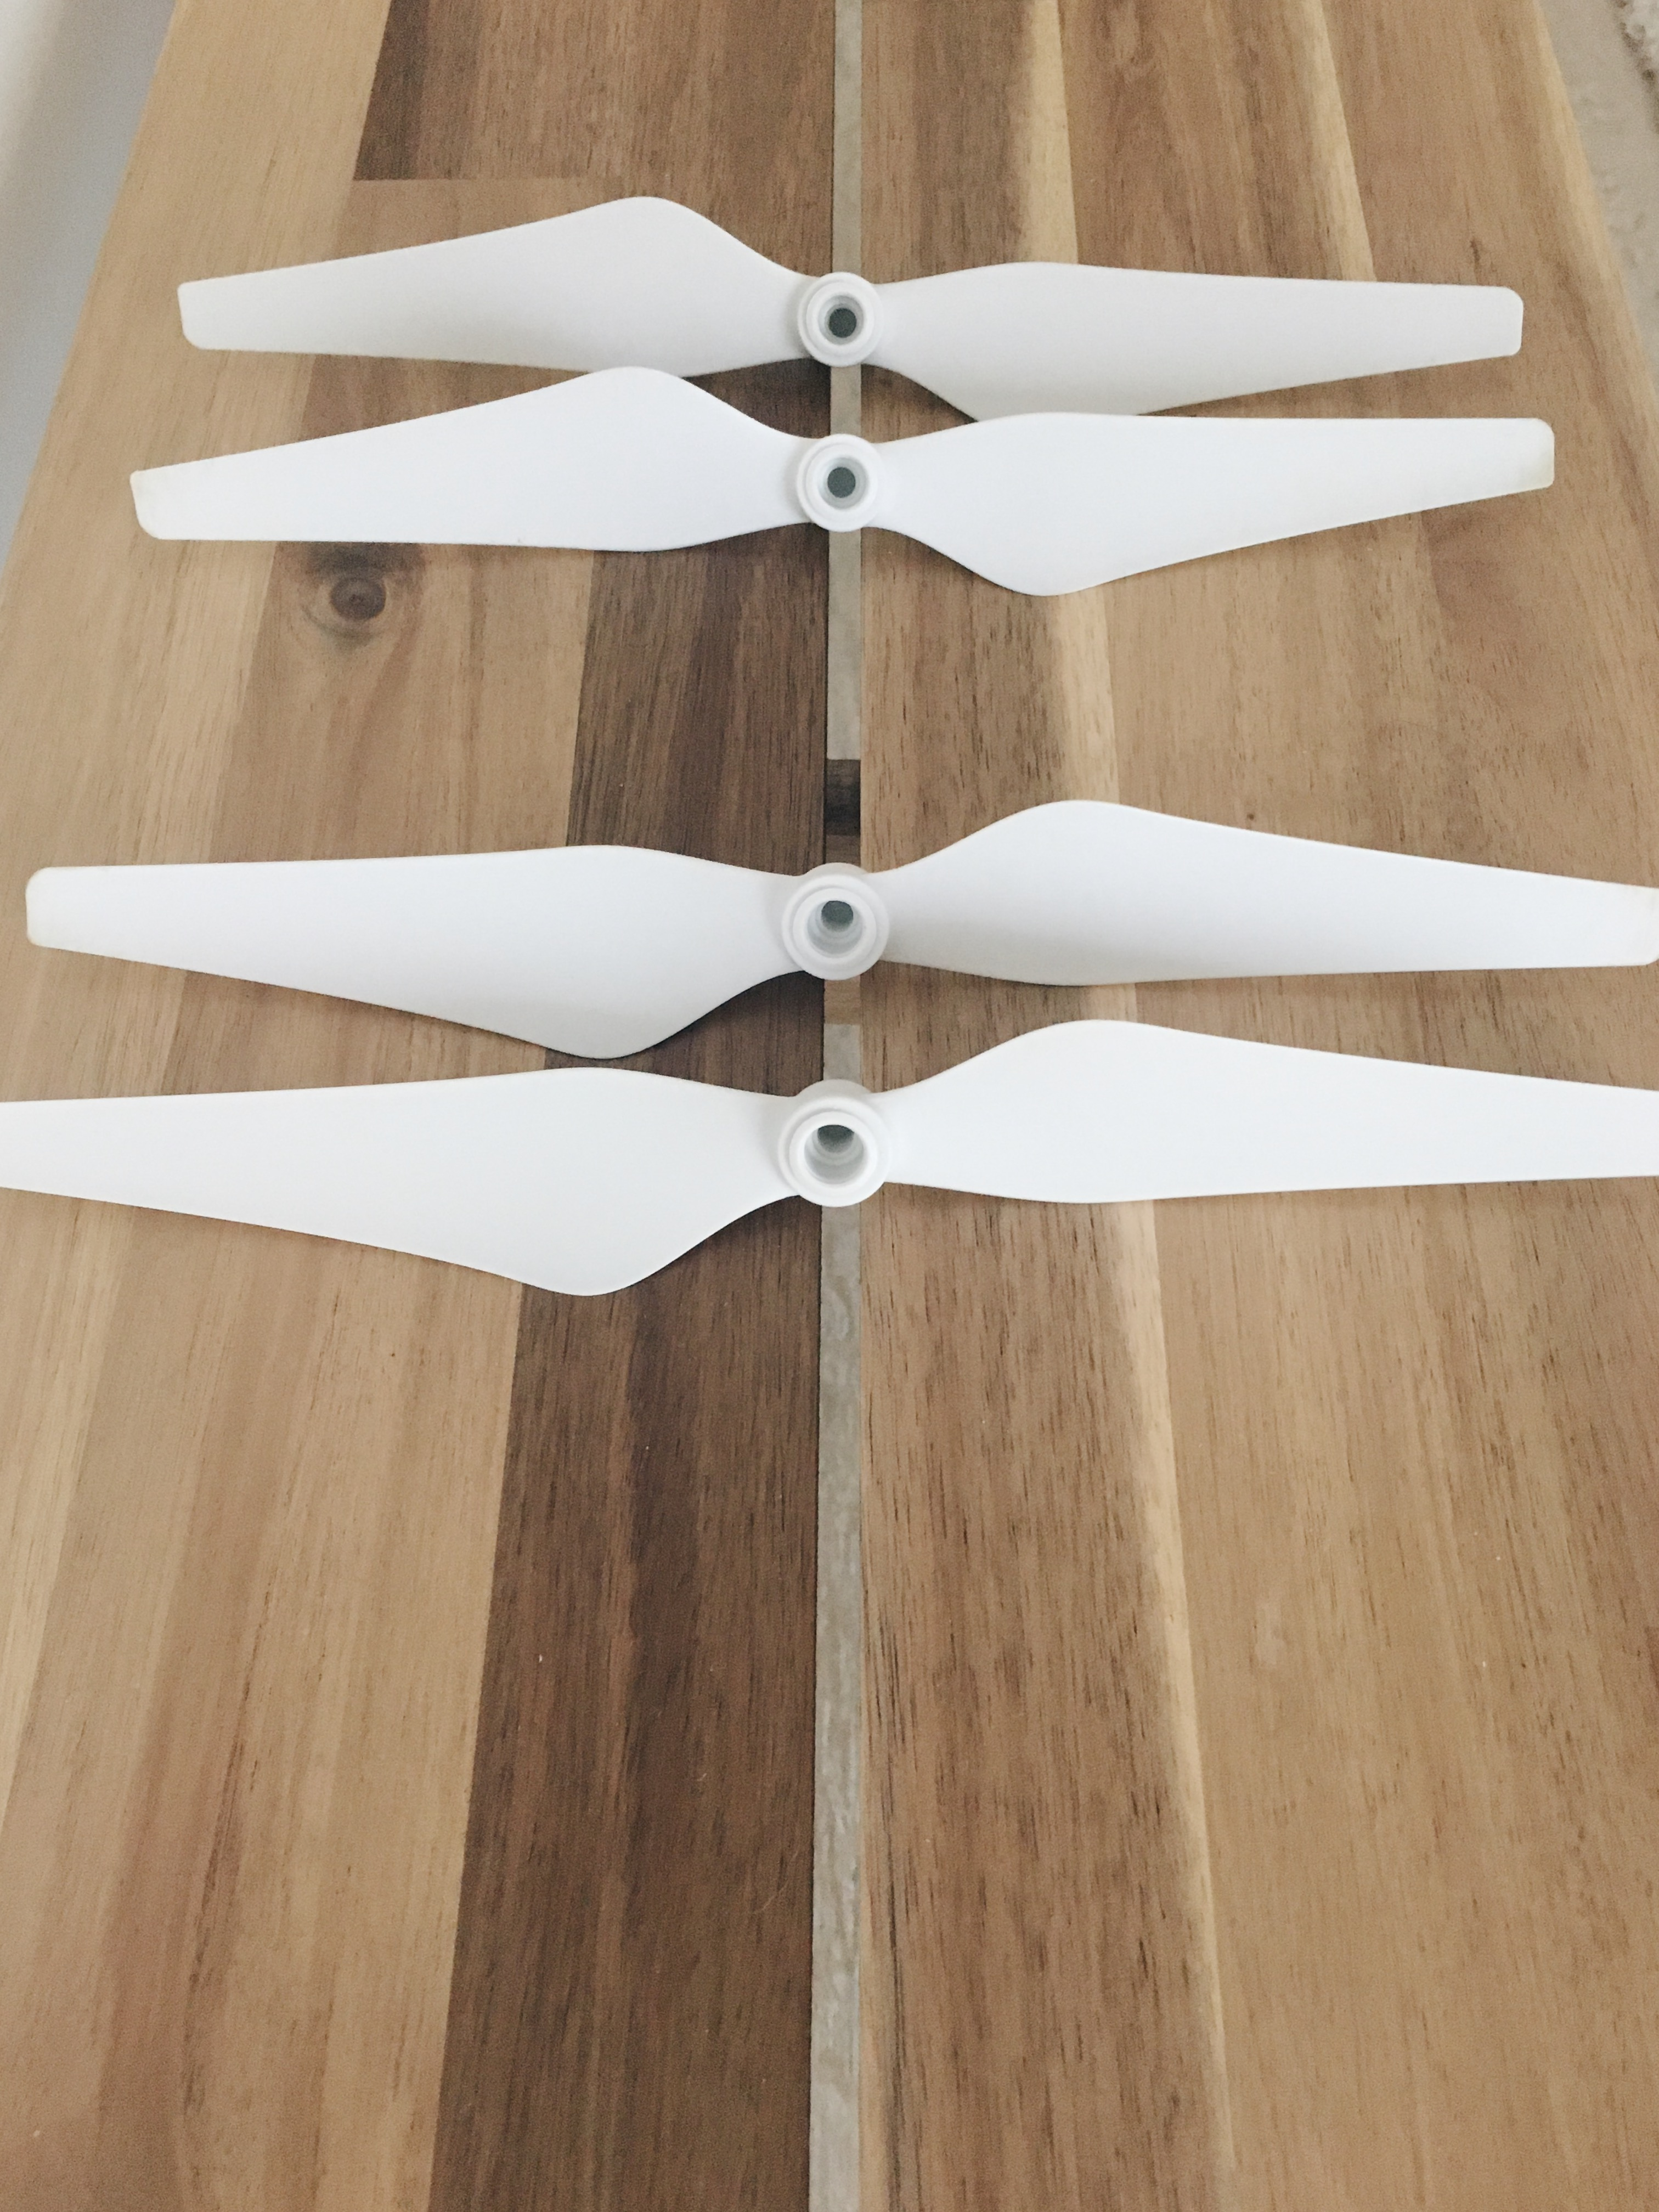 Drone blades